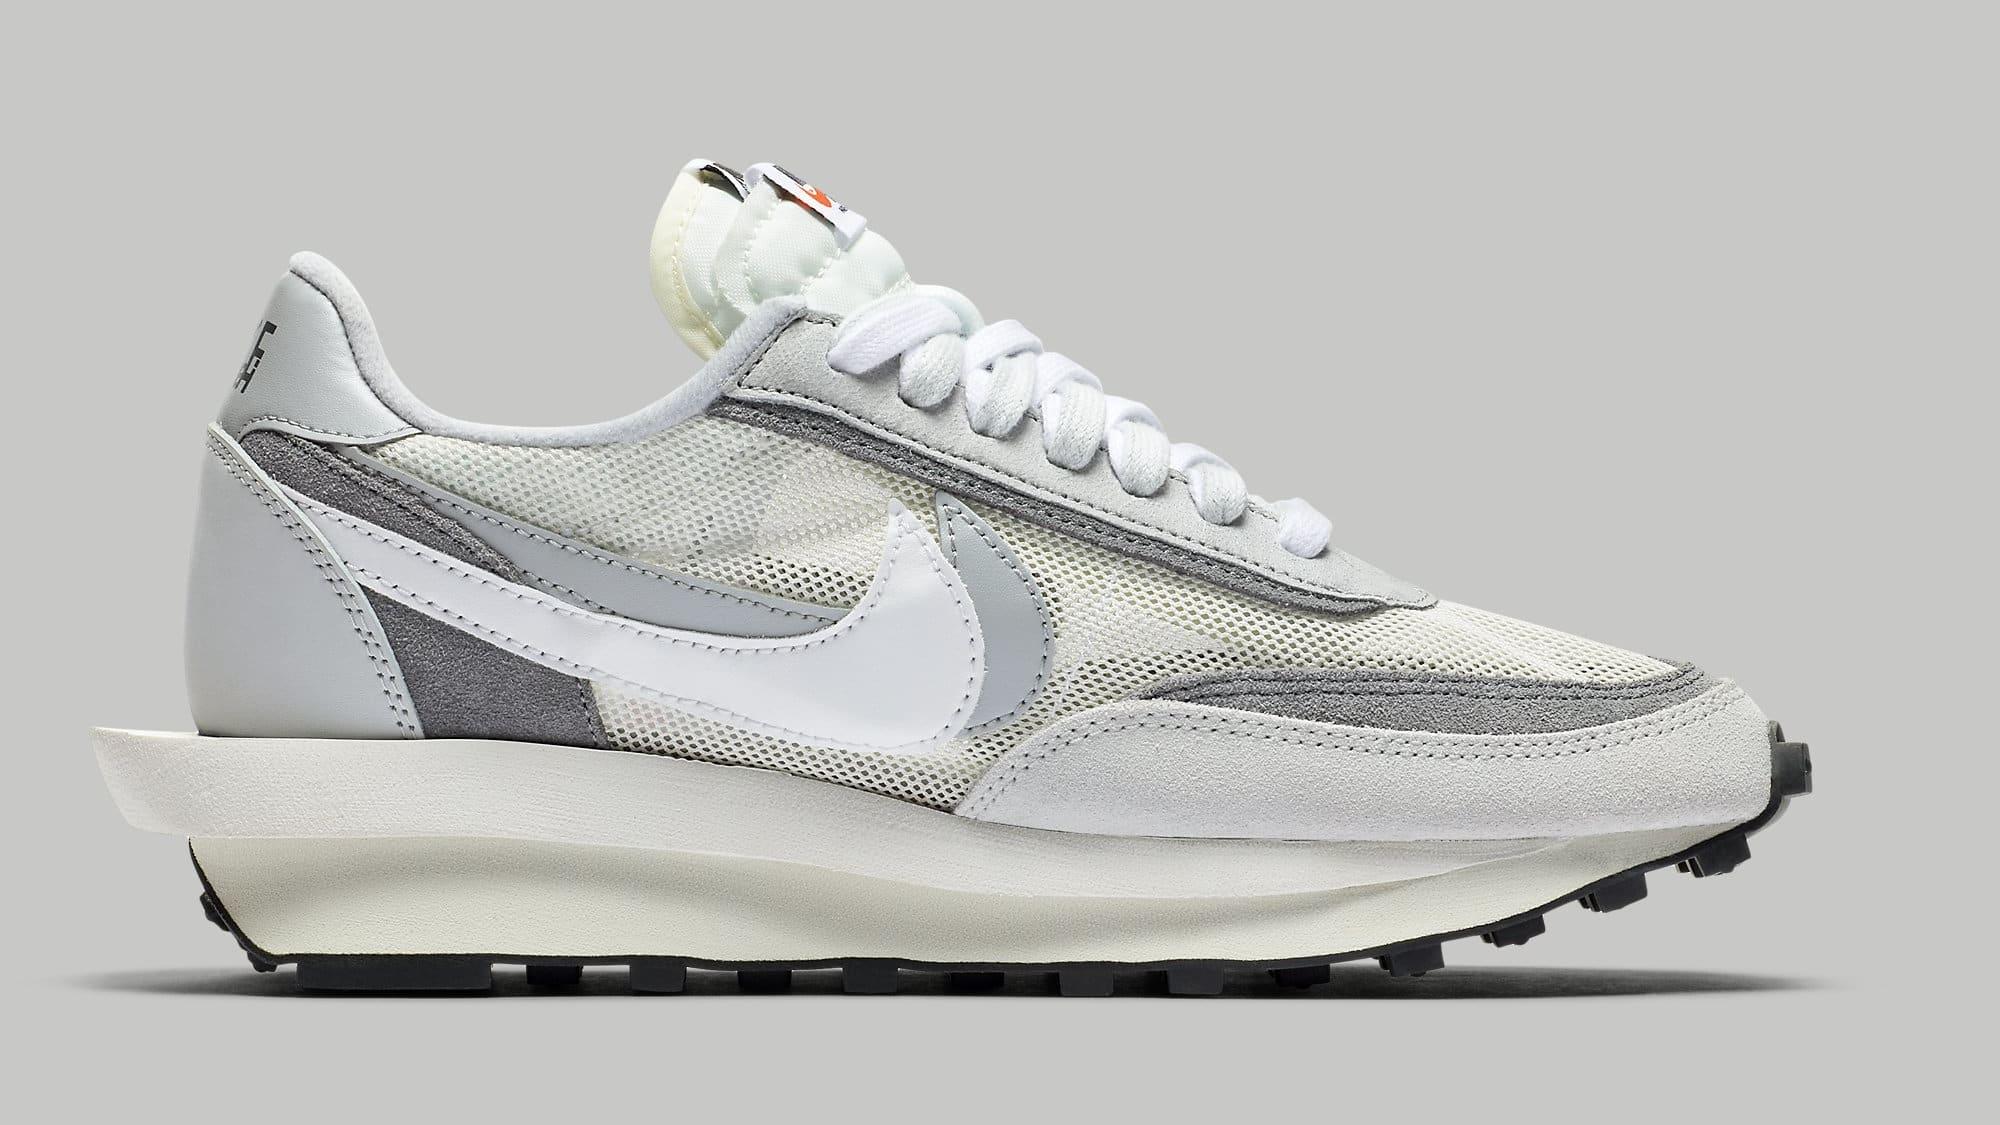 Sacai Nike LDWaffle Summit White Wolf Grey Release Date BV0073-100 Medial